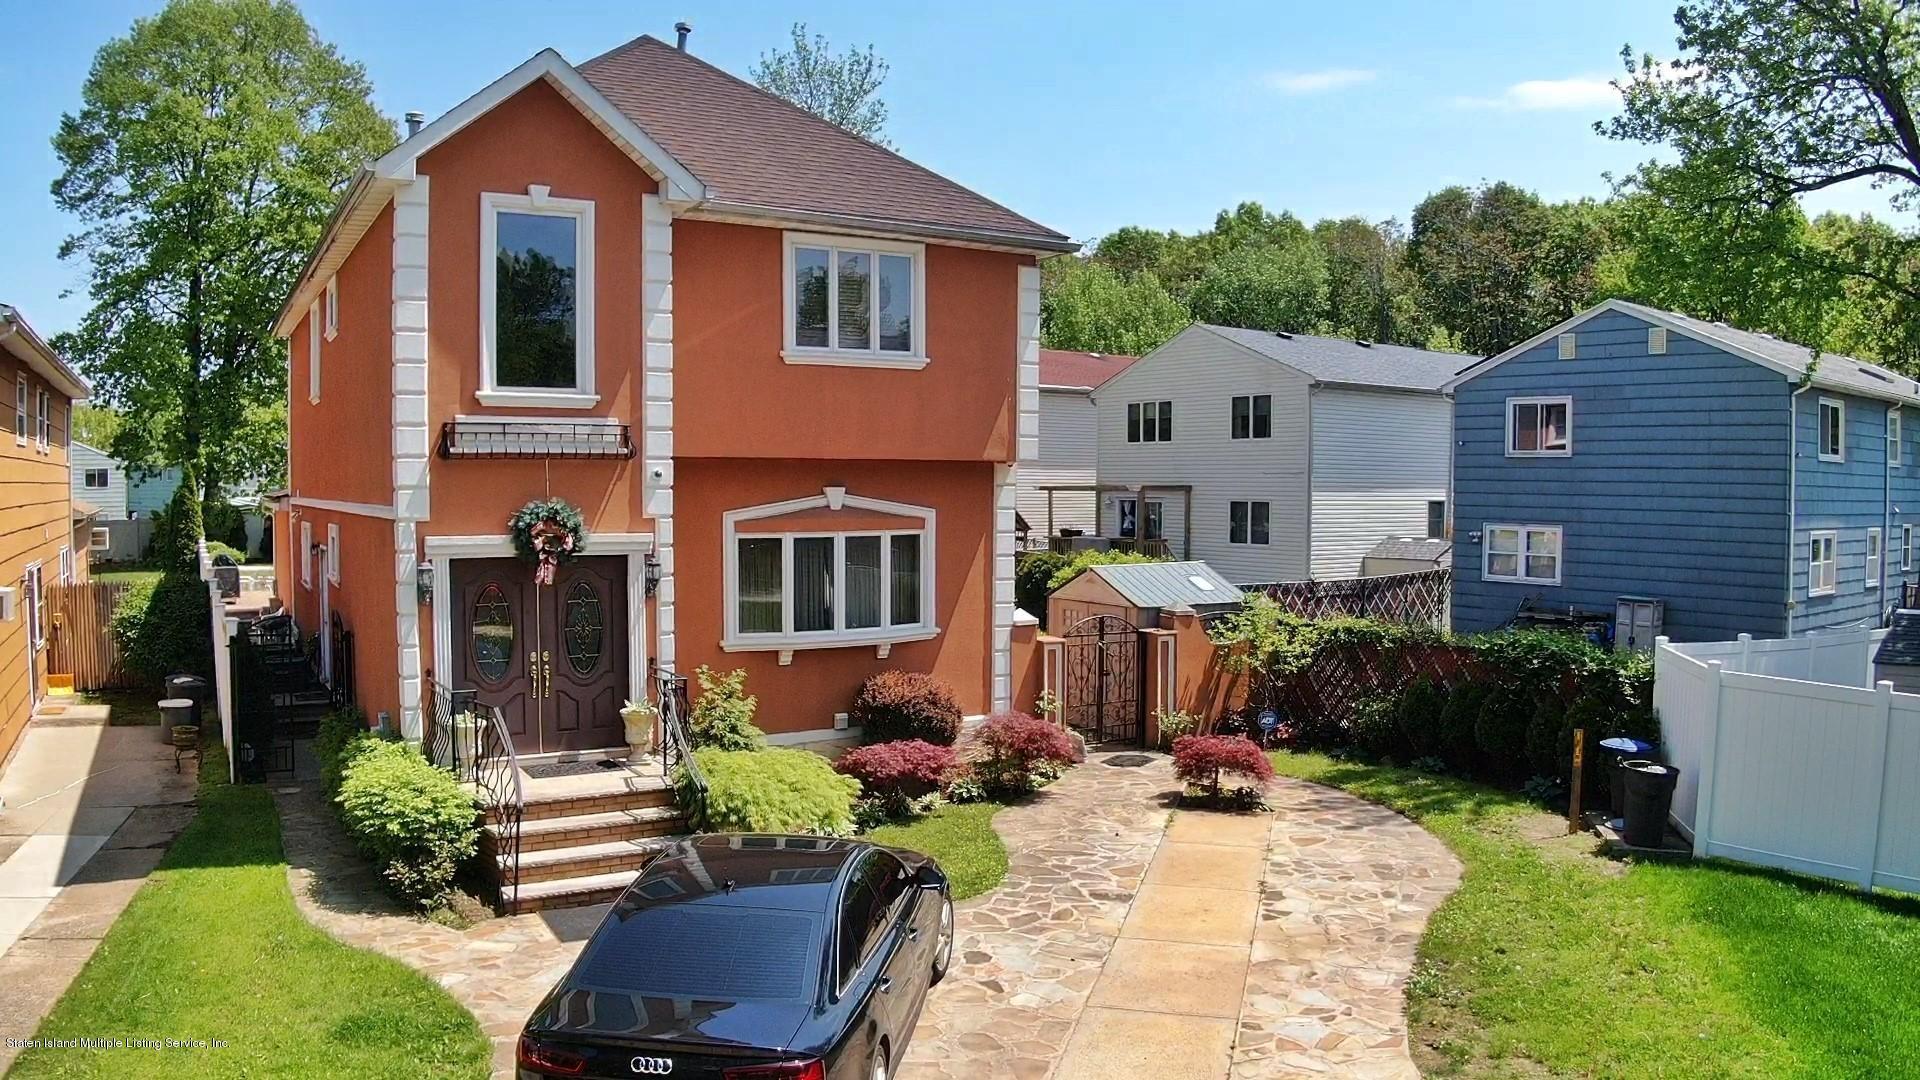 Single Family - Detached 67 Marvin Road  Staten Island, NY 10309, MLS-1128691-2